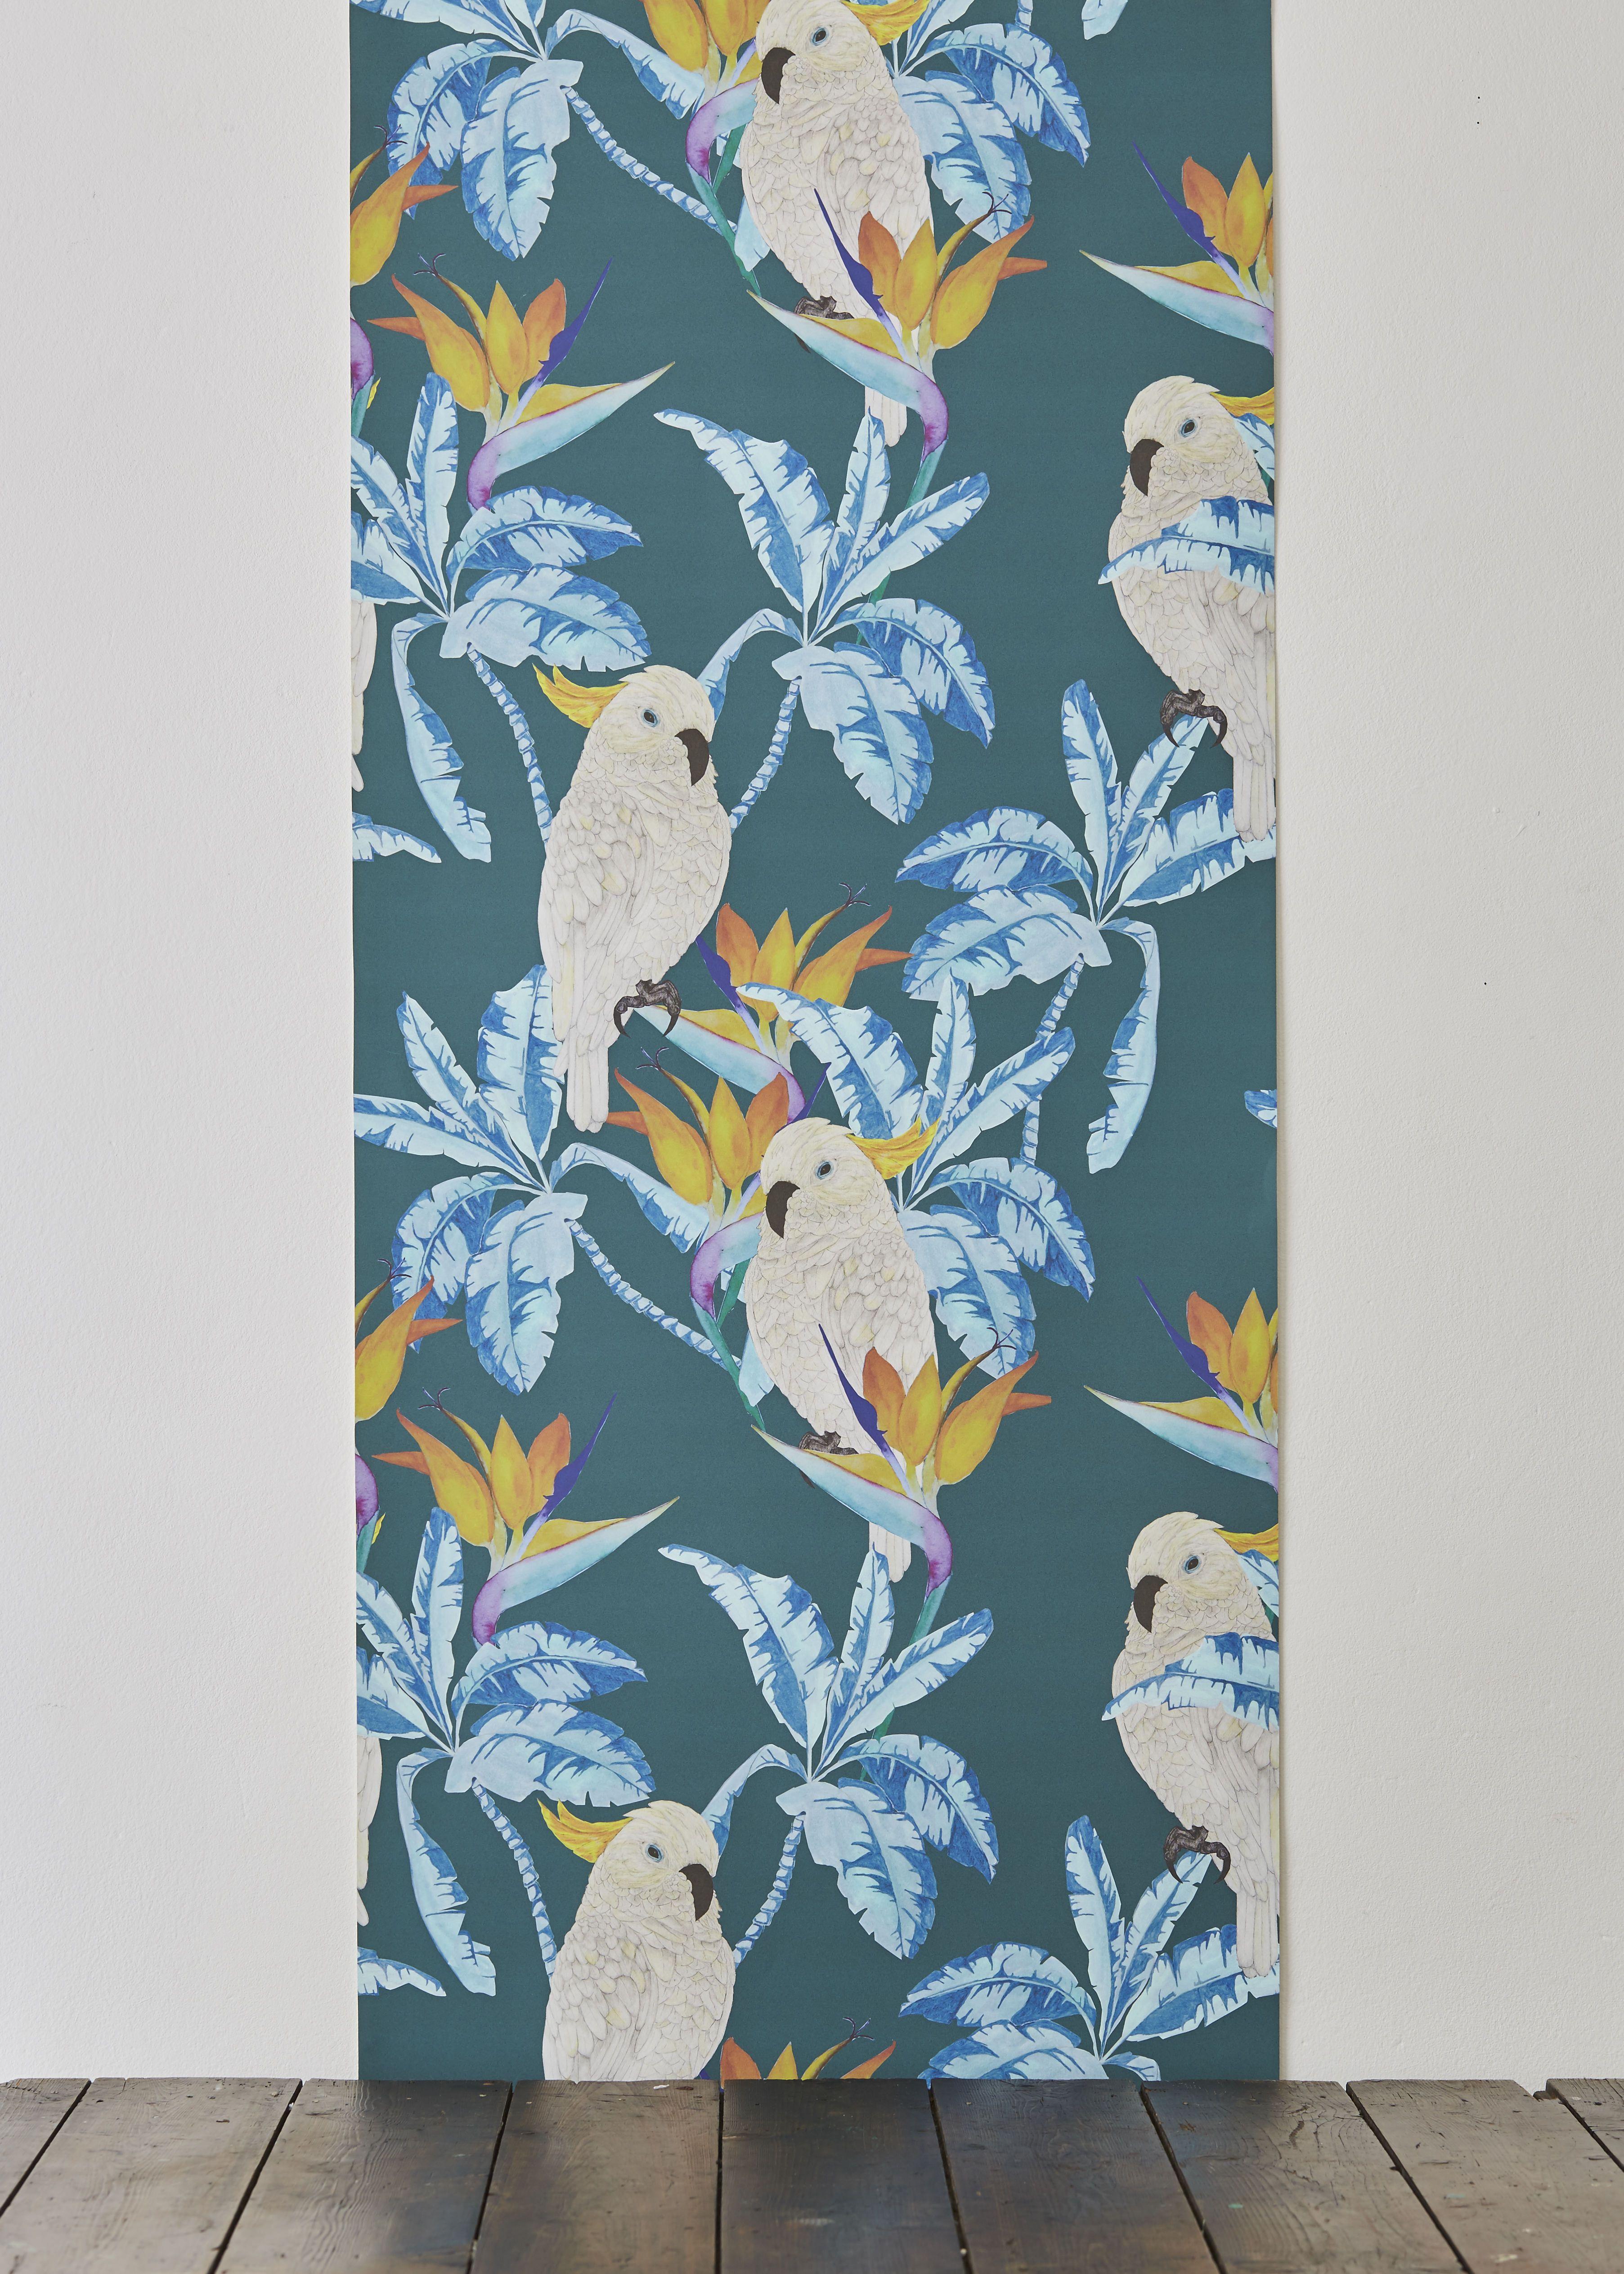 'Birds in Paradise' wallpaper designed by Alicia De Costa